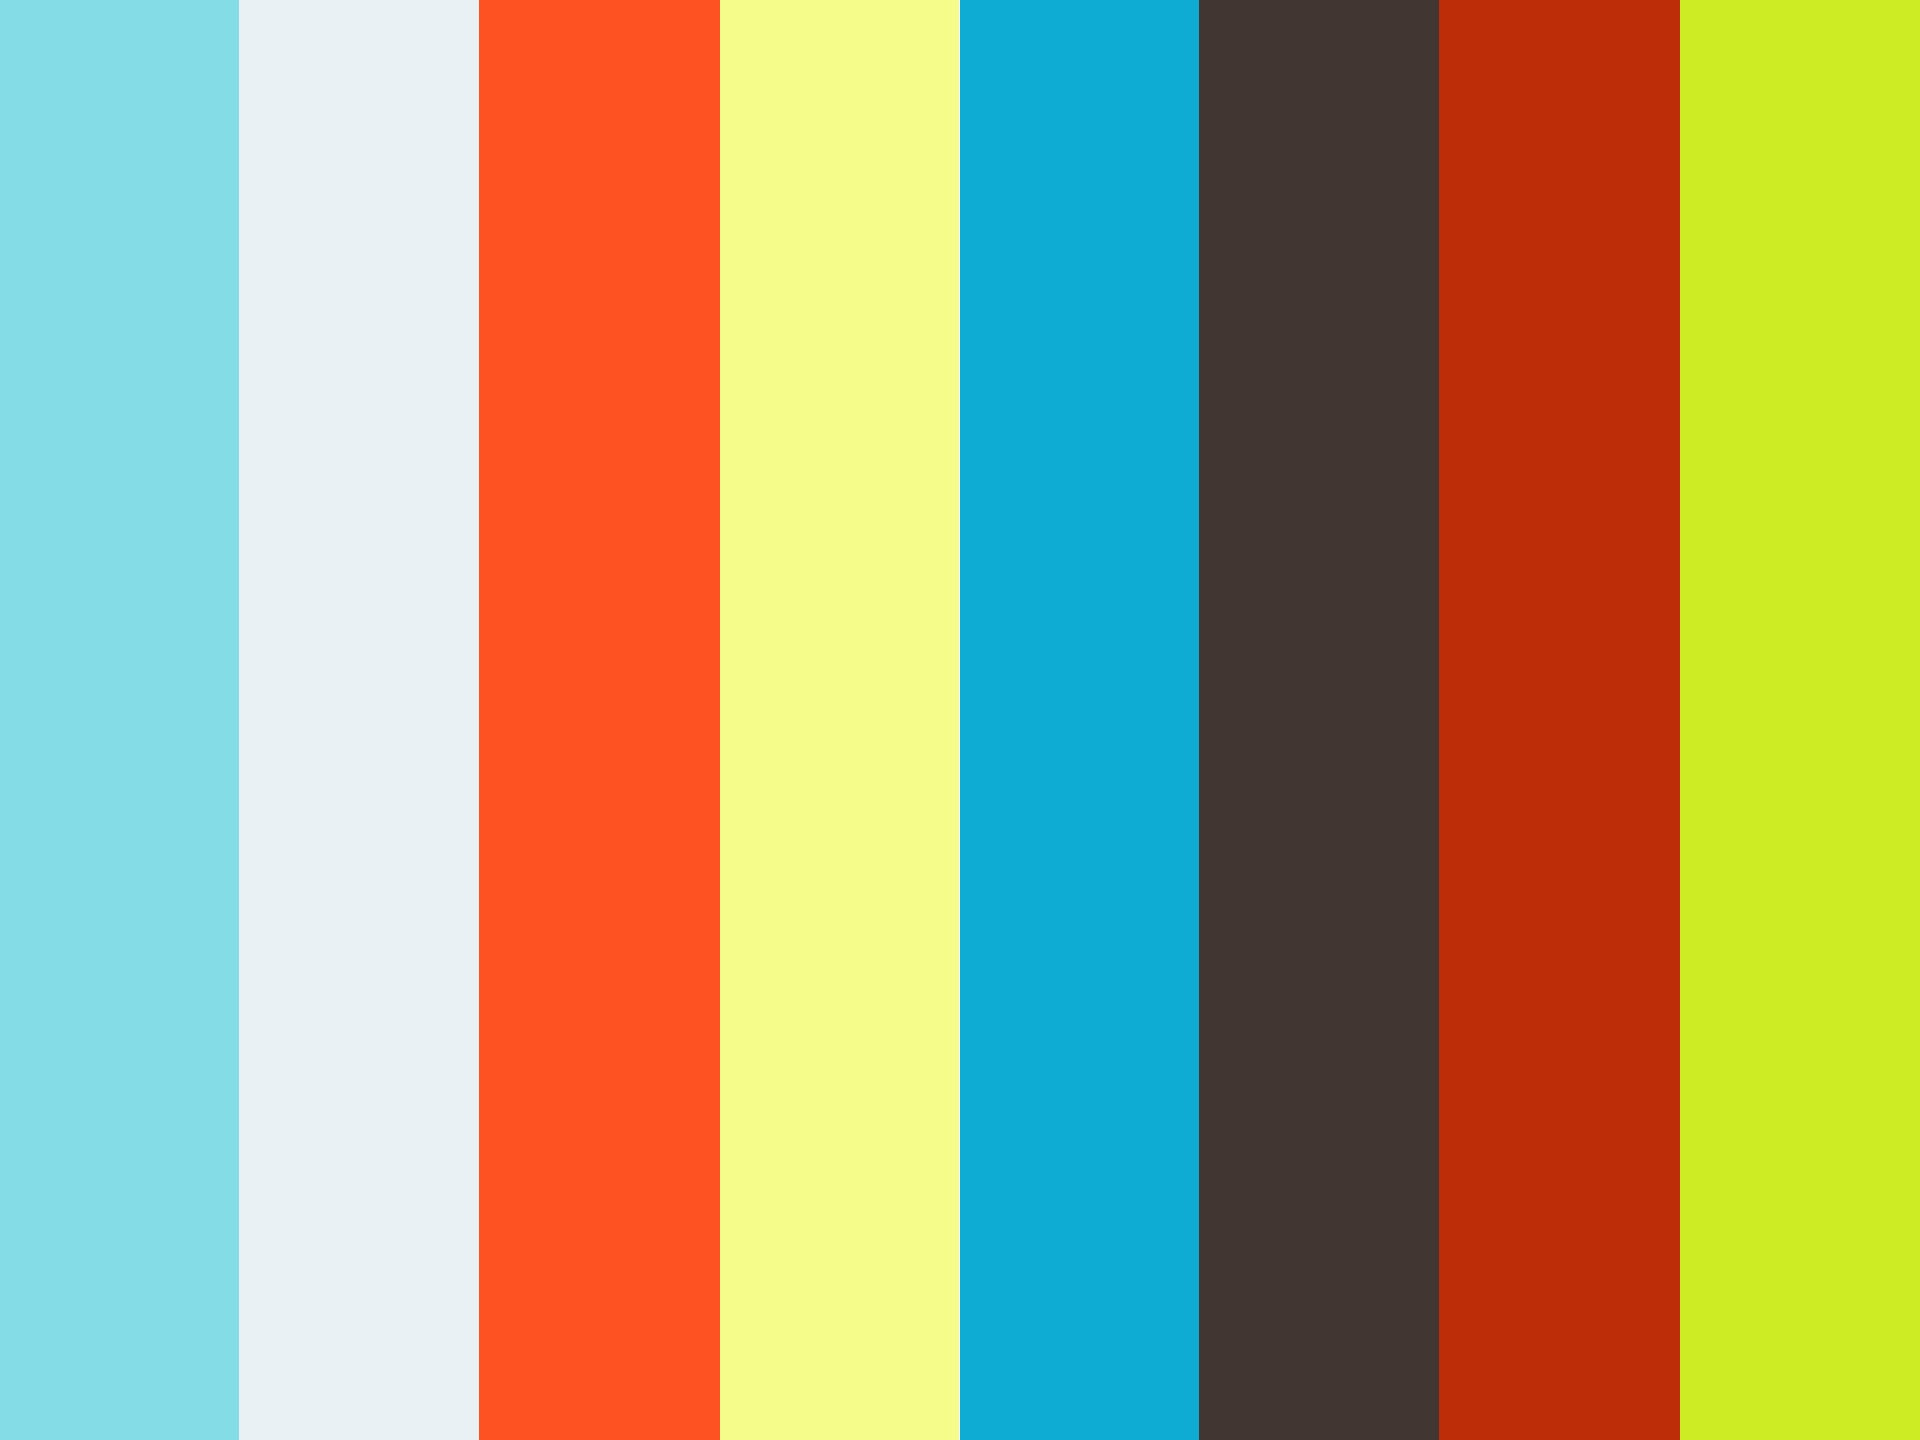 【Proflab】中原 貴教授インタビュー:日本歯科大学 生命歯学部 発生・再生医科学講座 #1 講座紹介